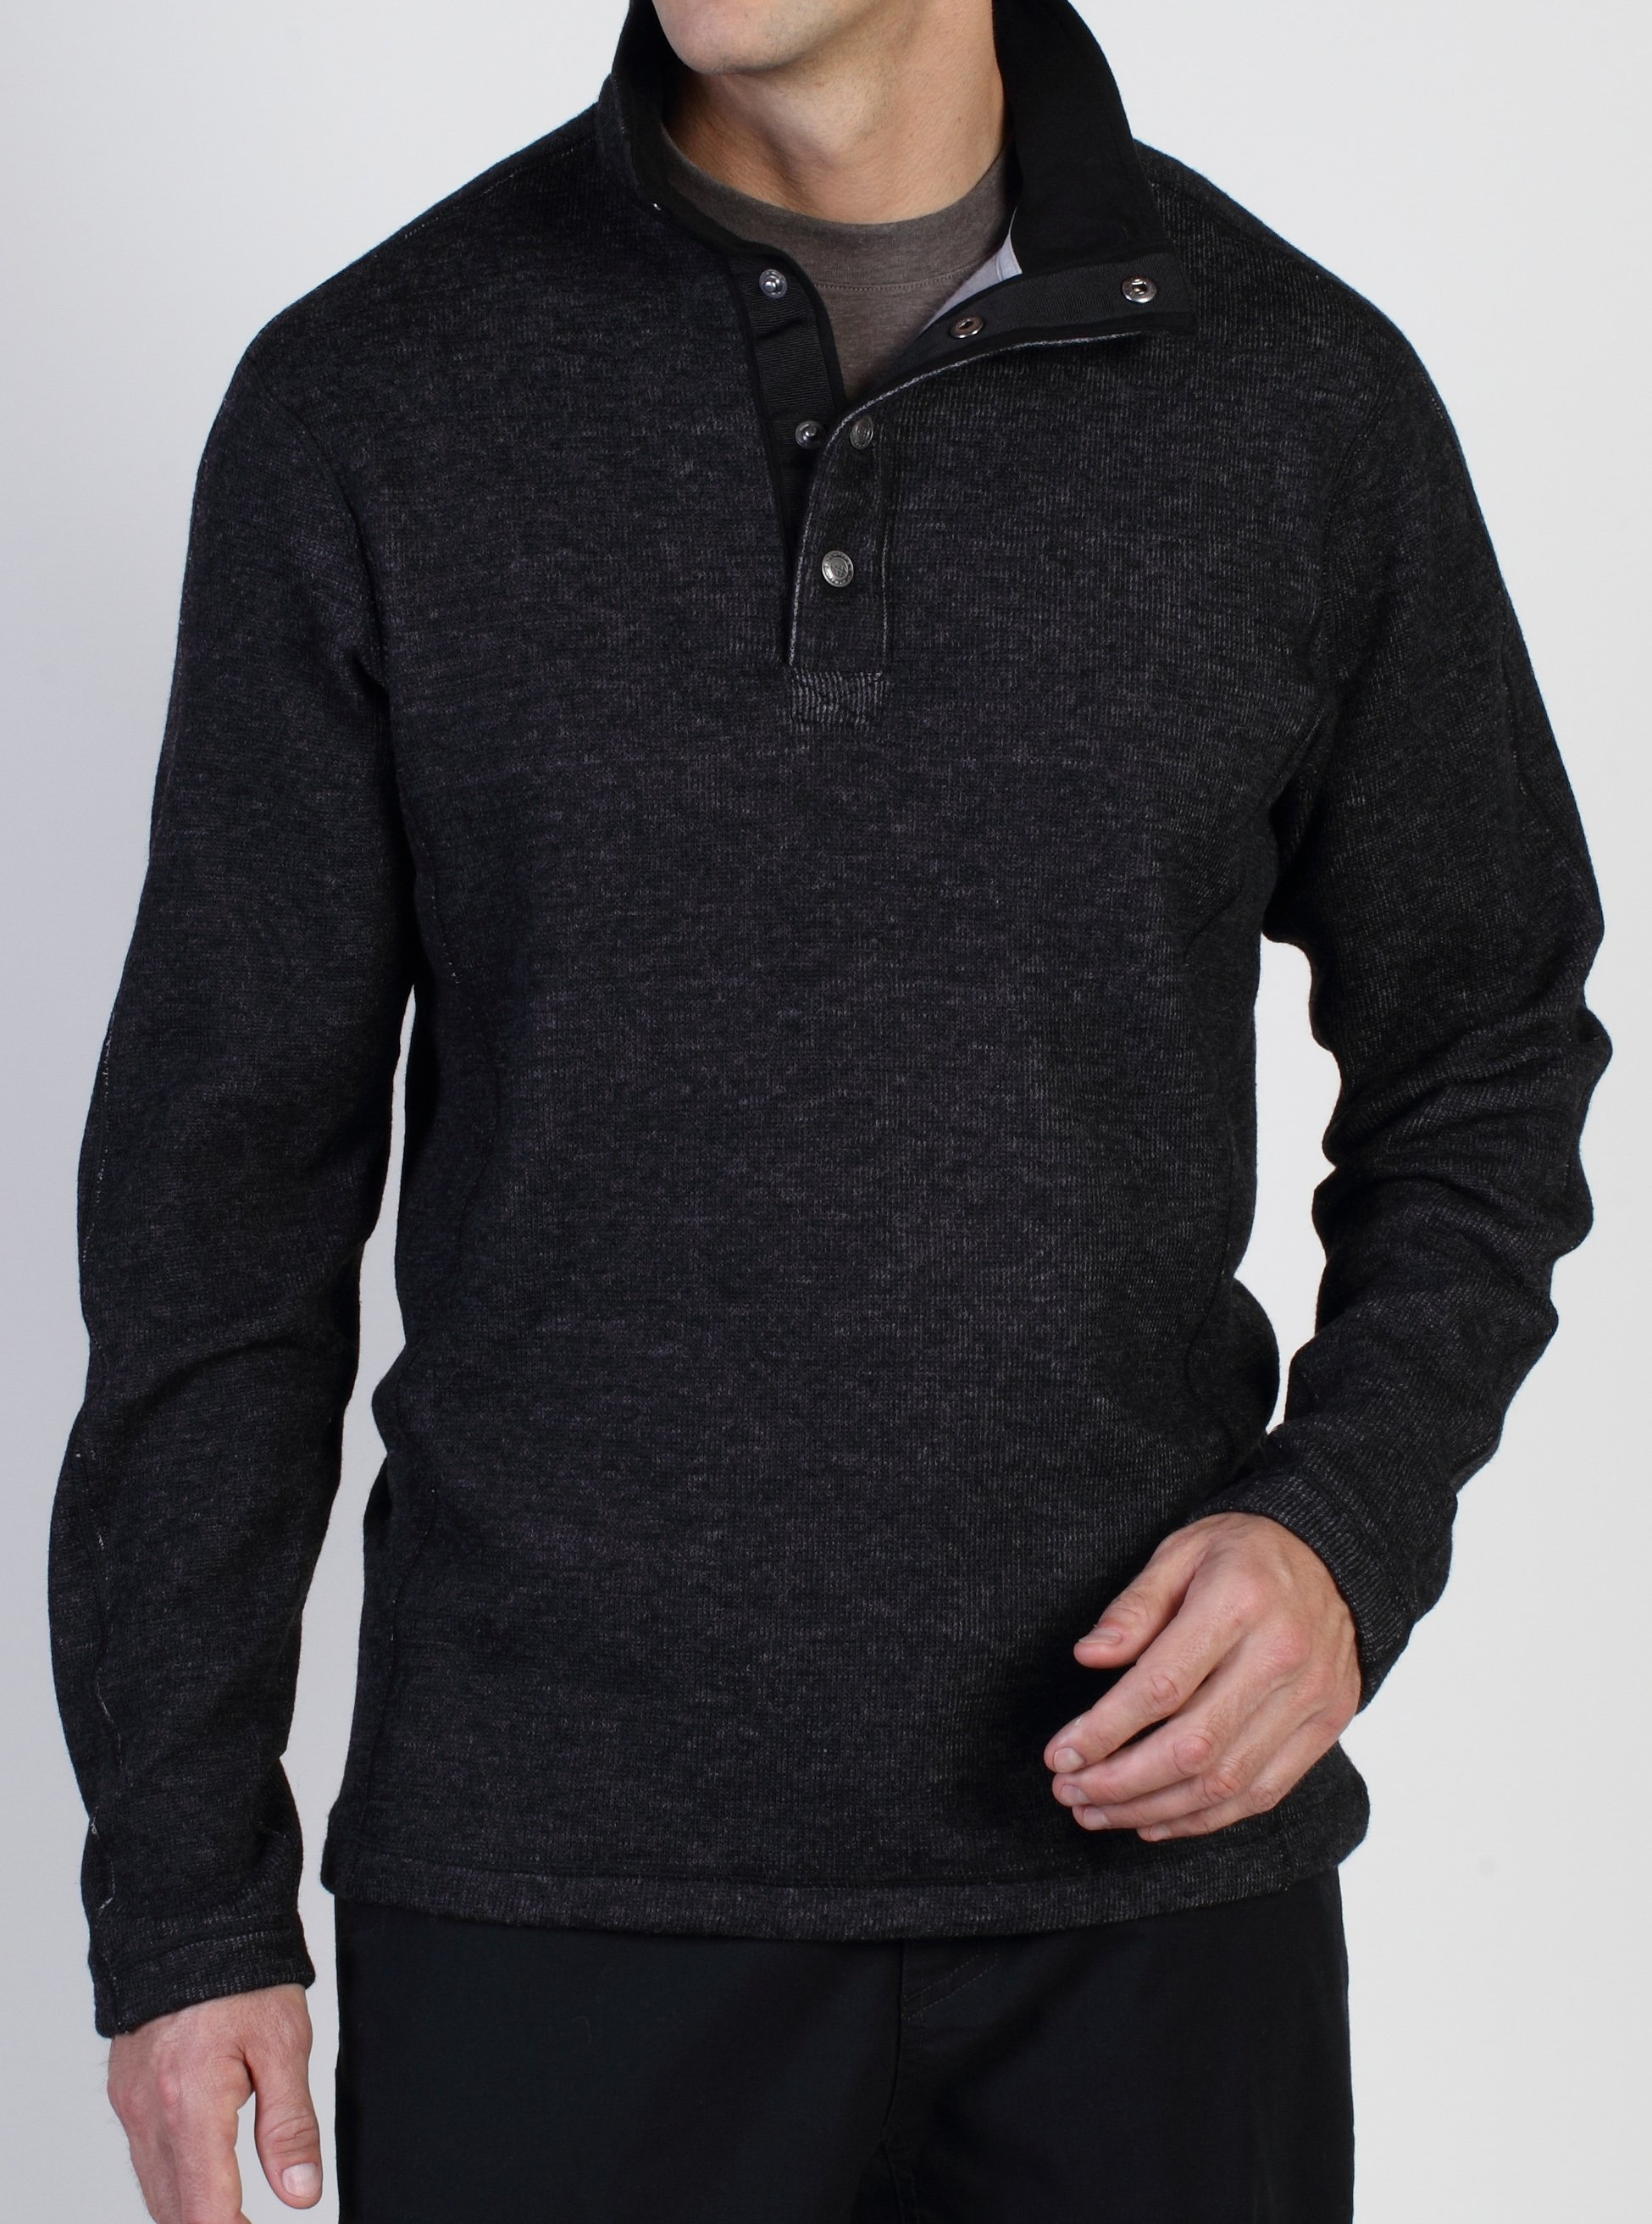 Ruvido Snap Henley Sweater, Black, large